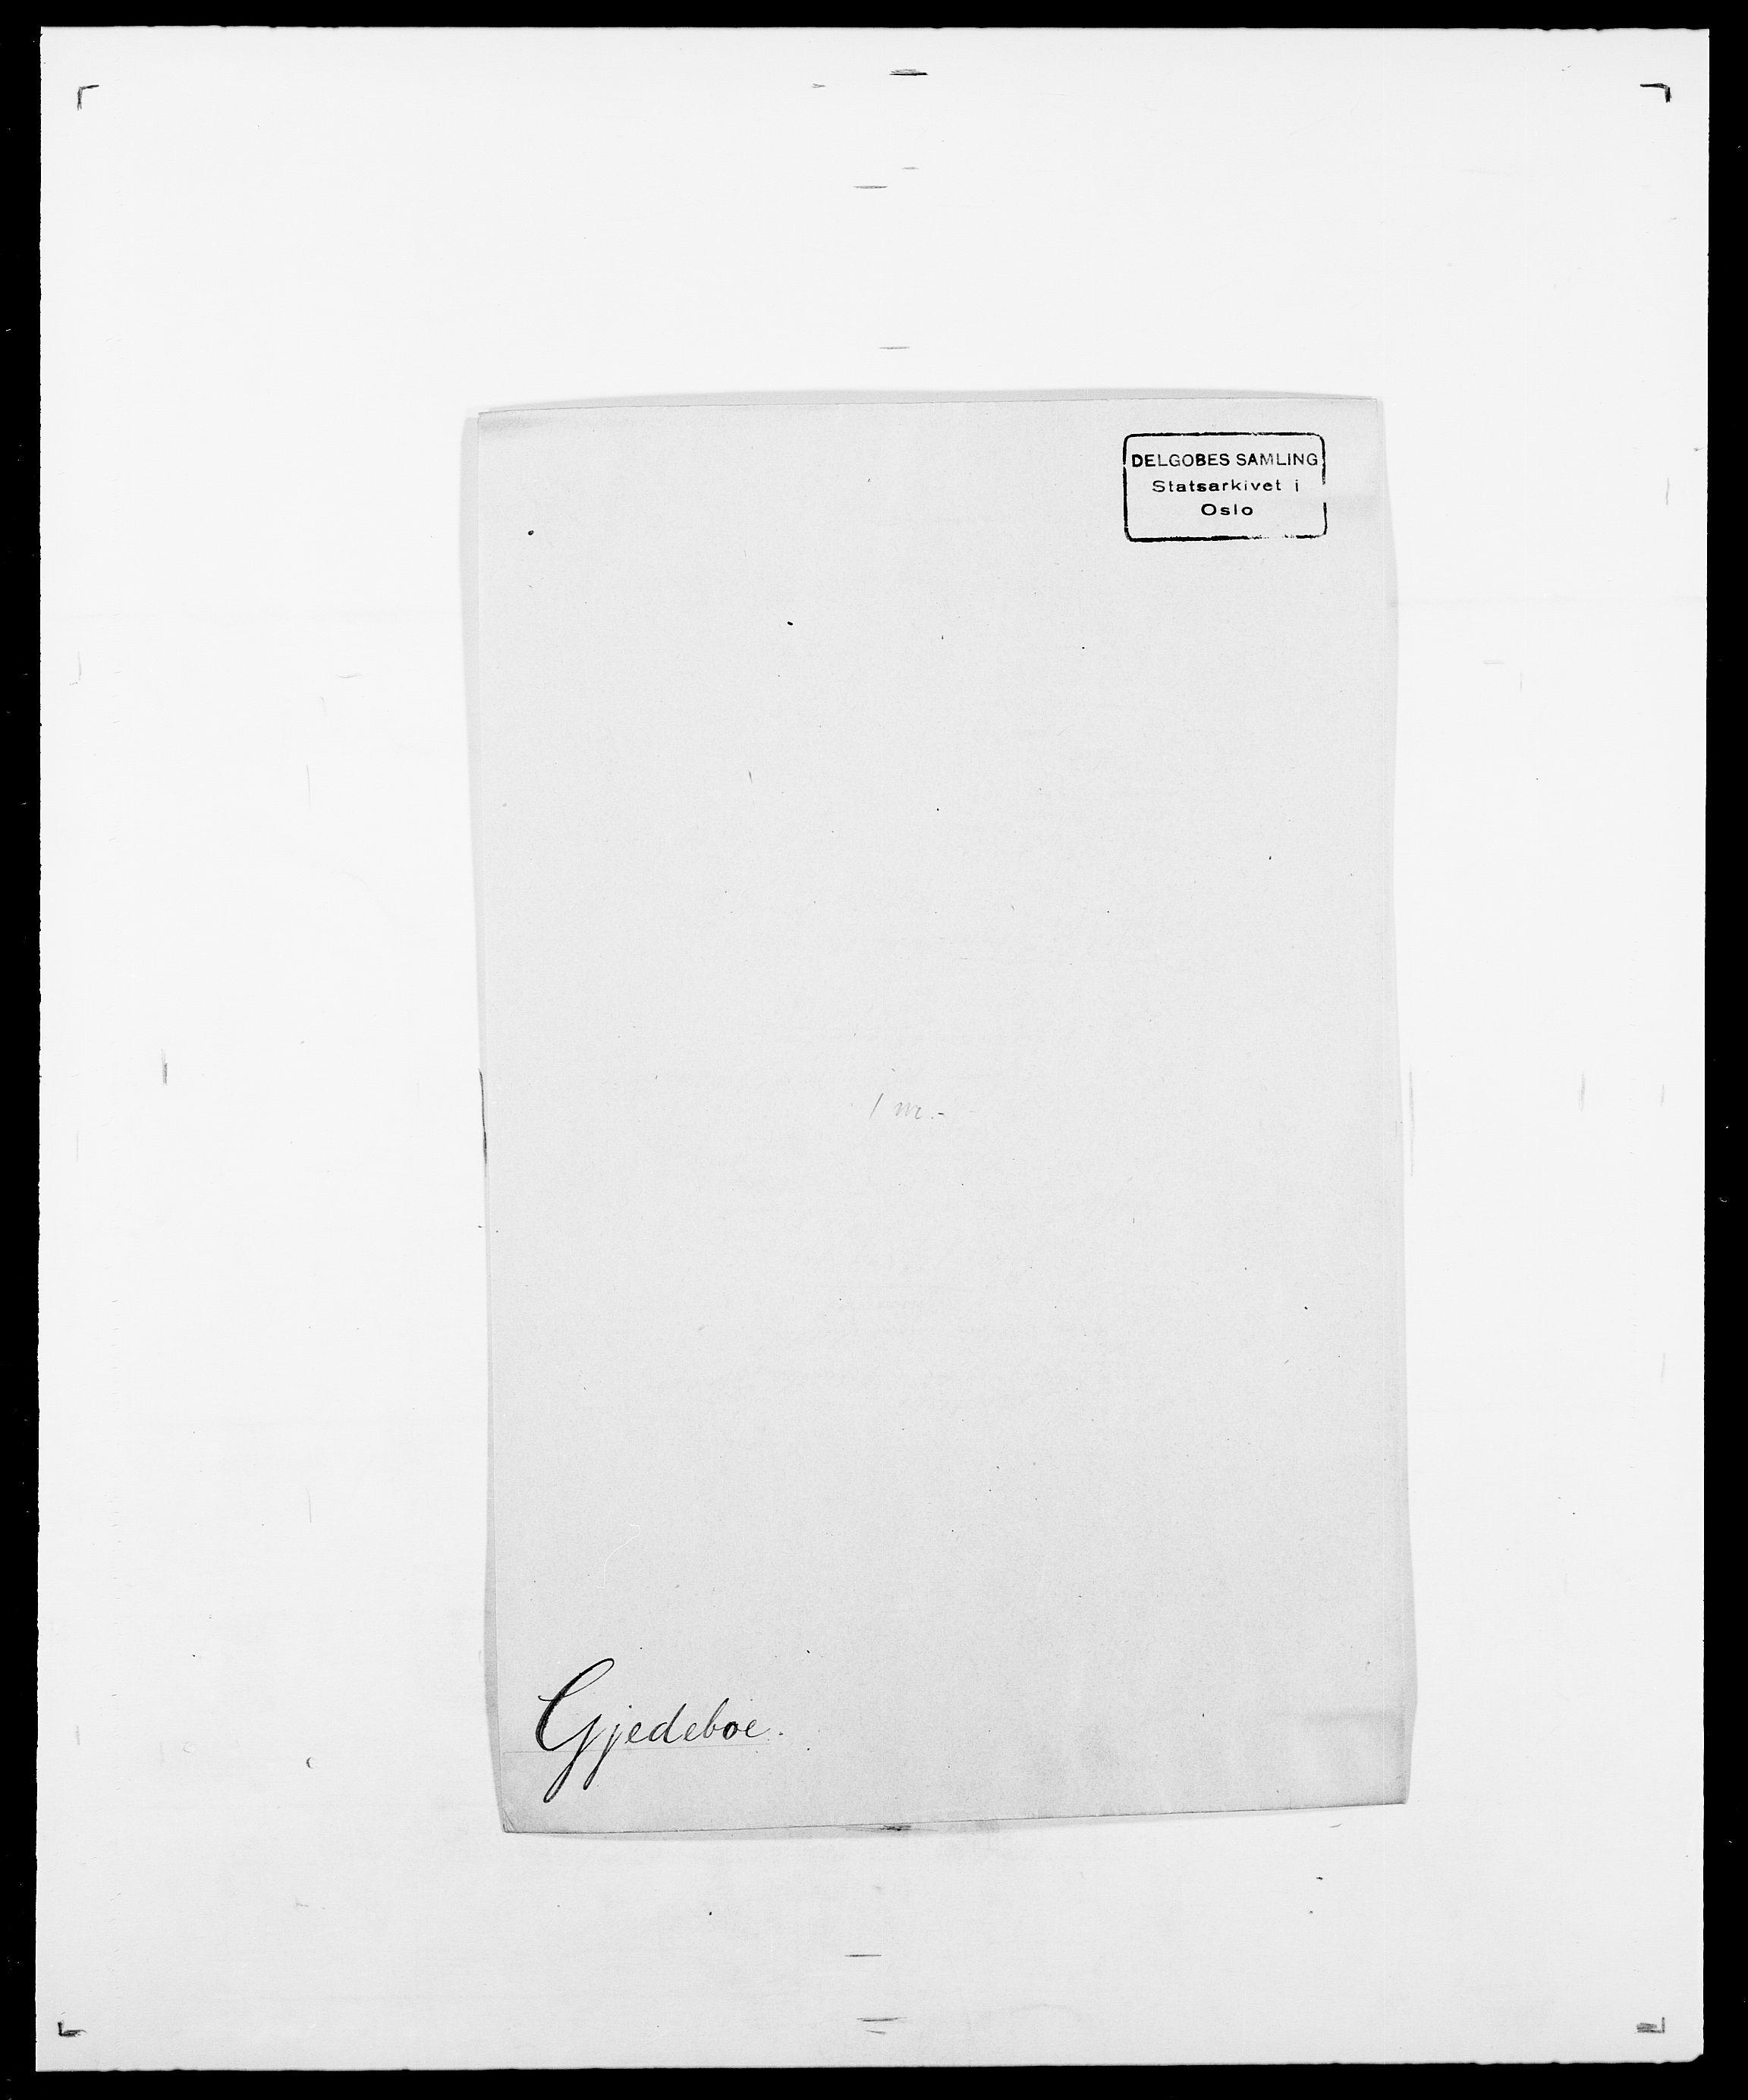 SAO, Delgobe, Charles Antoine - samling, D/Da/L0014: Giebdhausen - Grip, s. 92